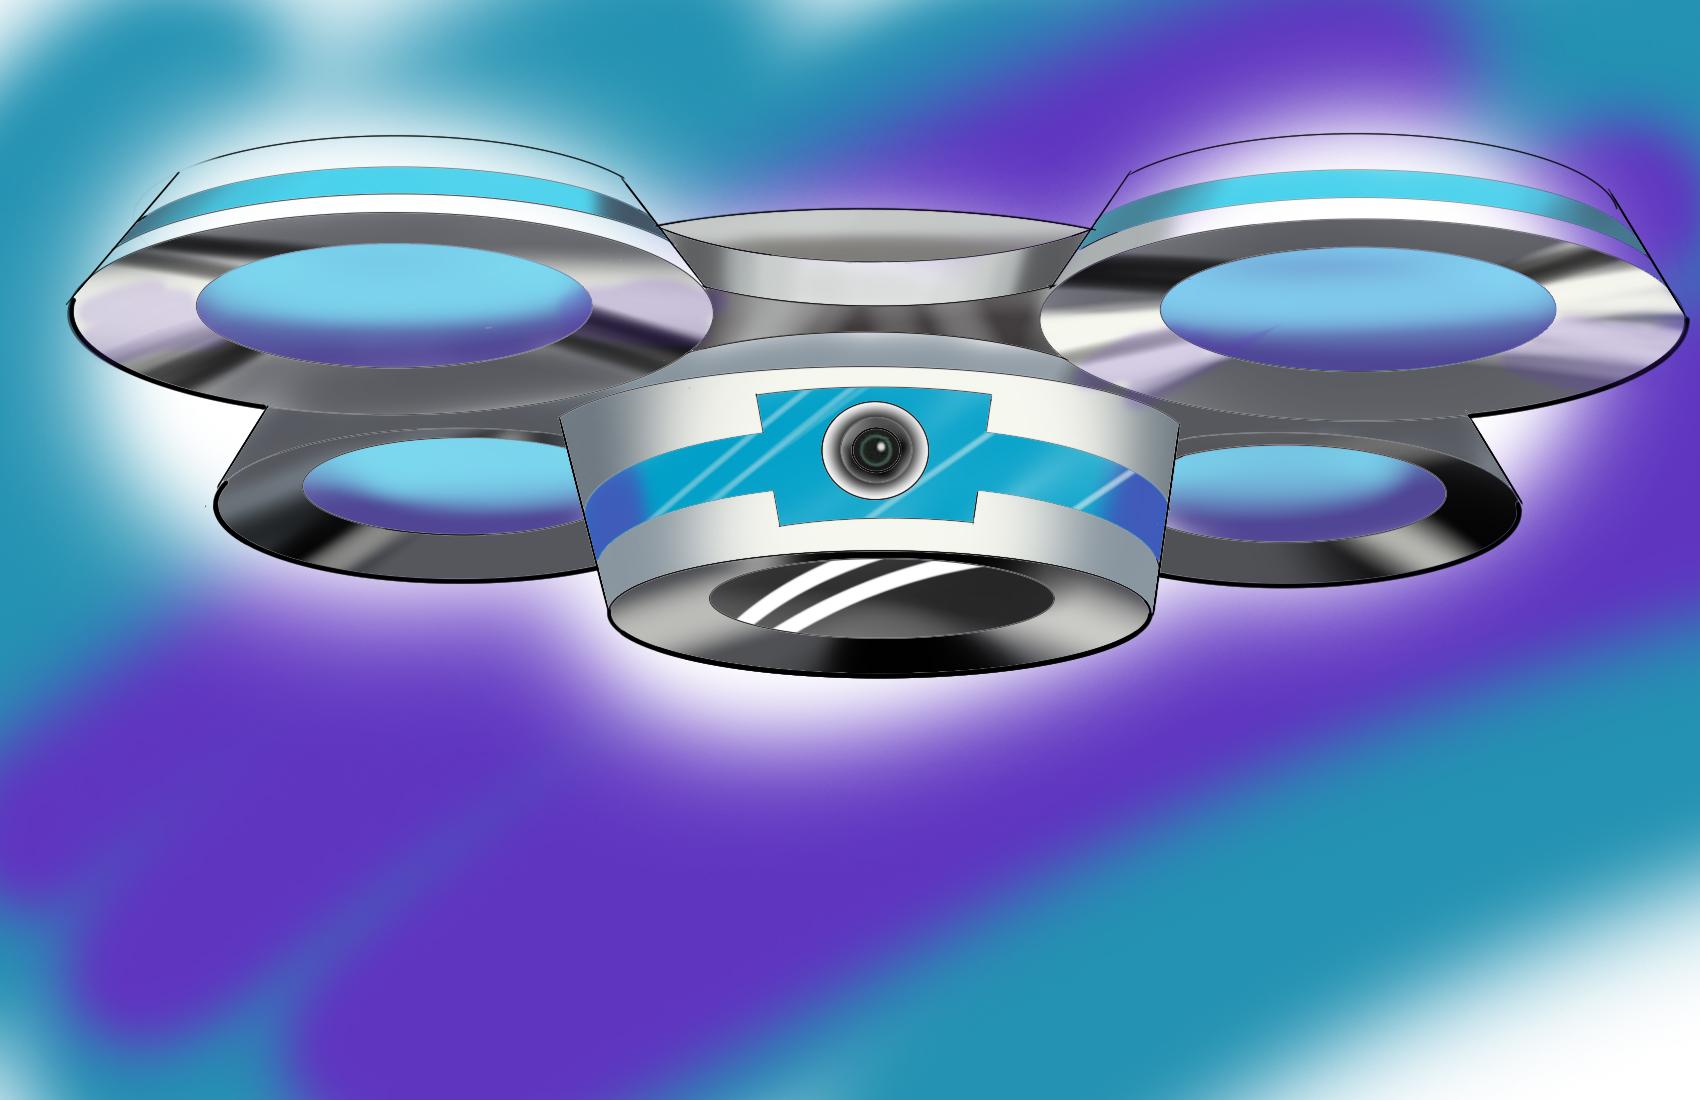 Drone 1 Concept.jpg